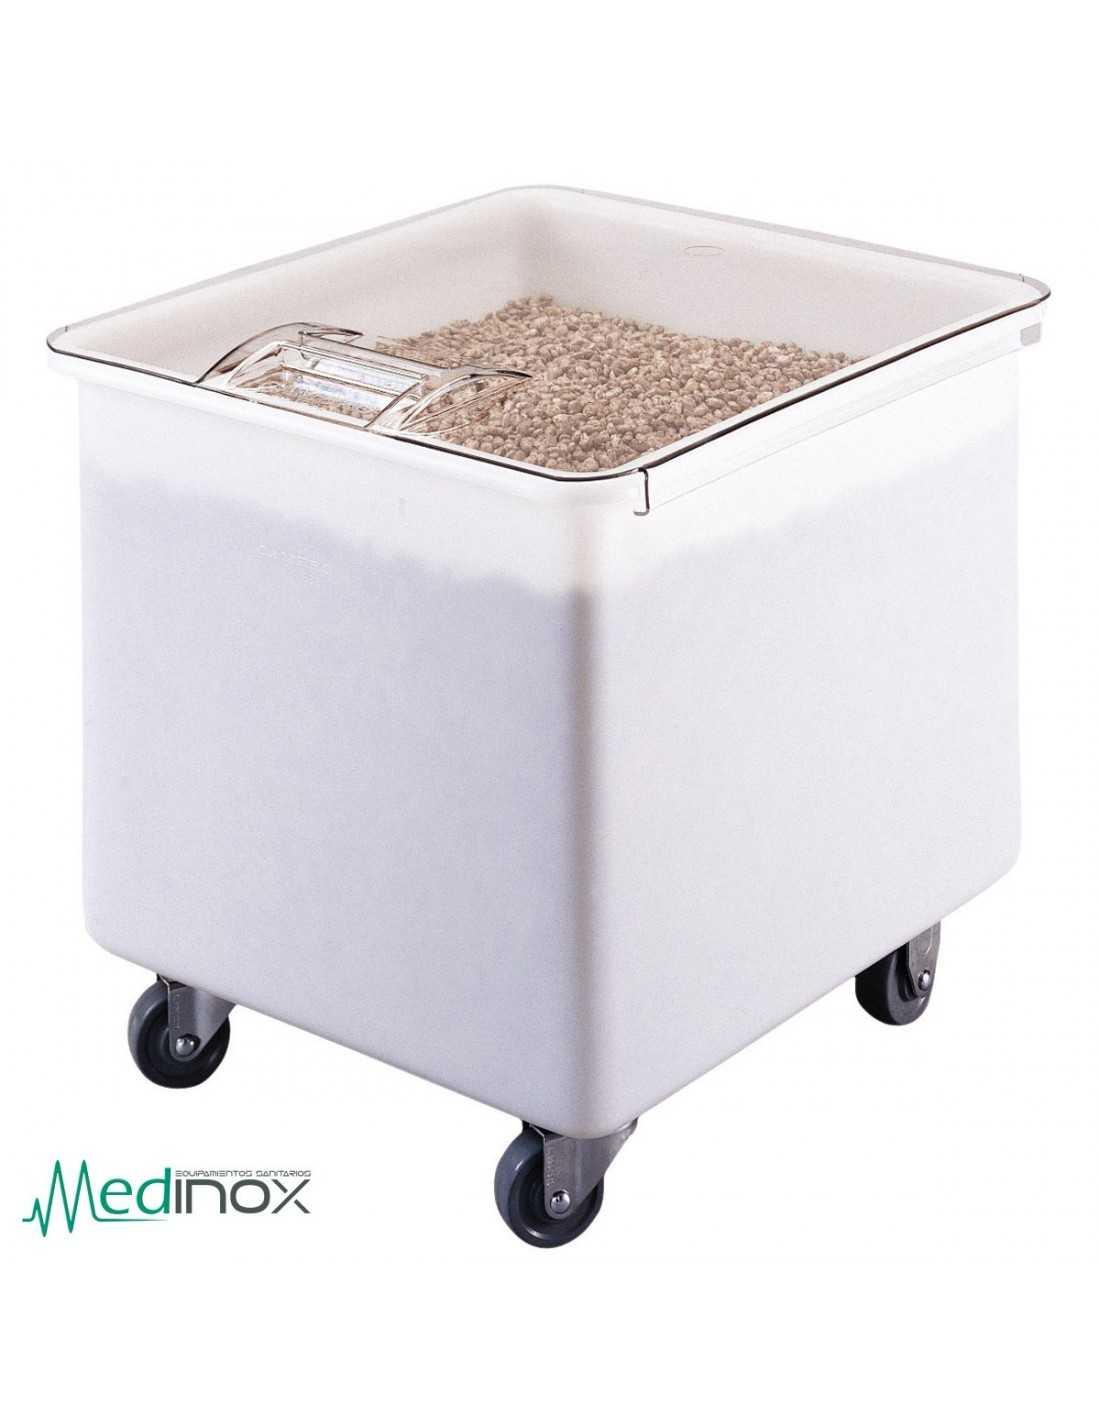 Cajas de almacenaje de plastico dmib32 con ruedas para - Caja de almacenaje ...